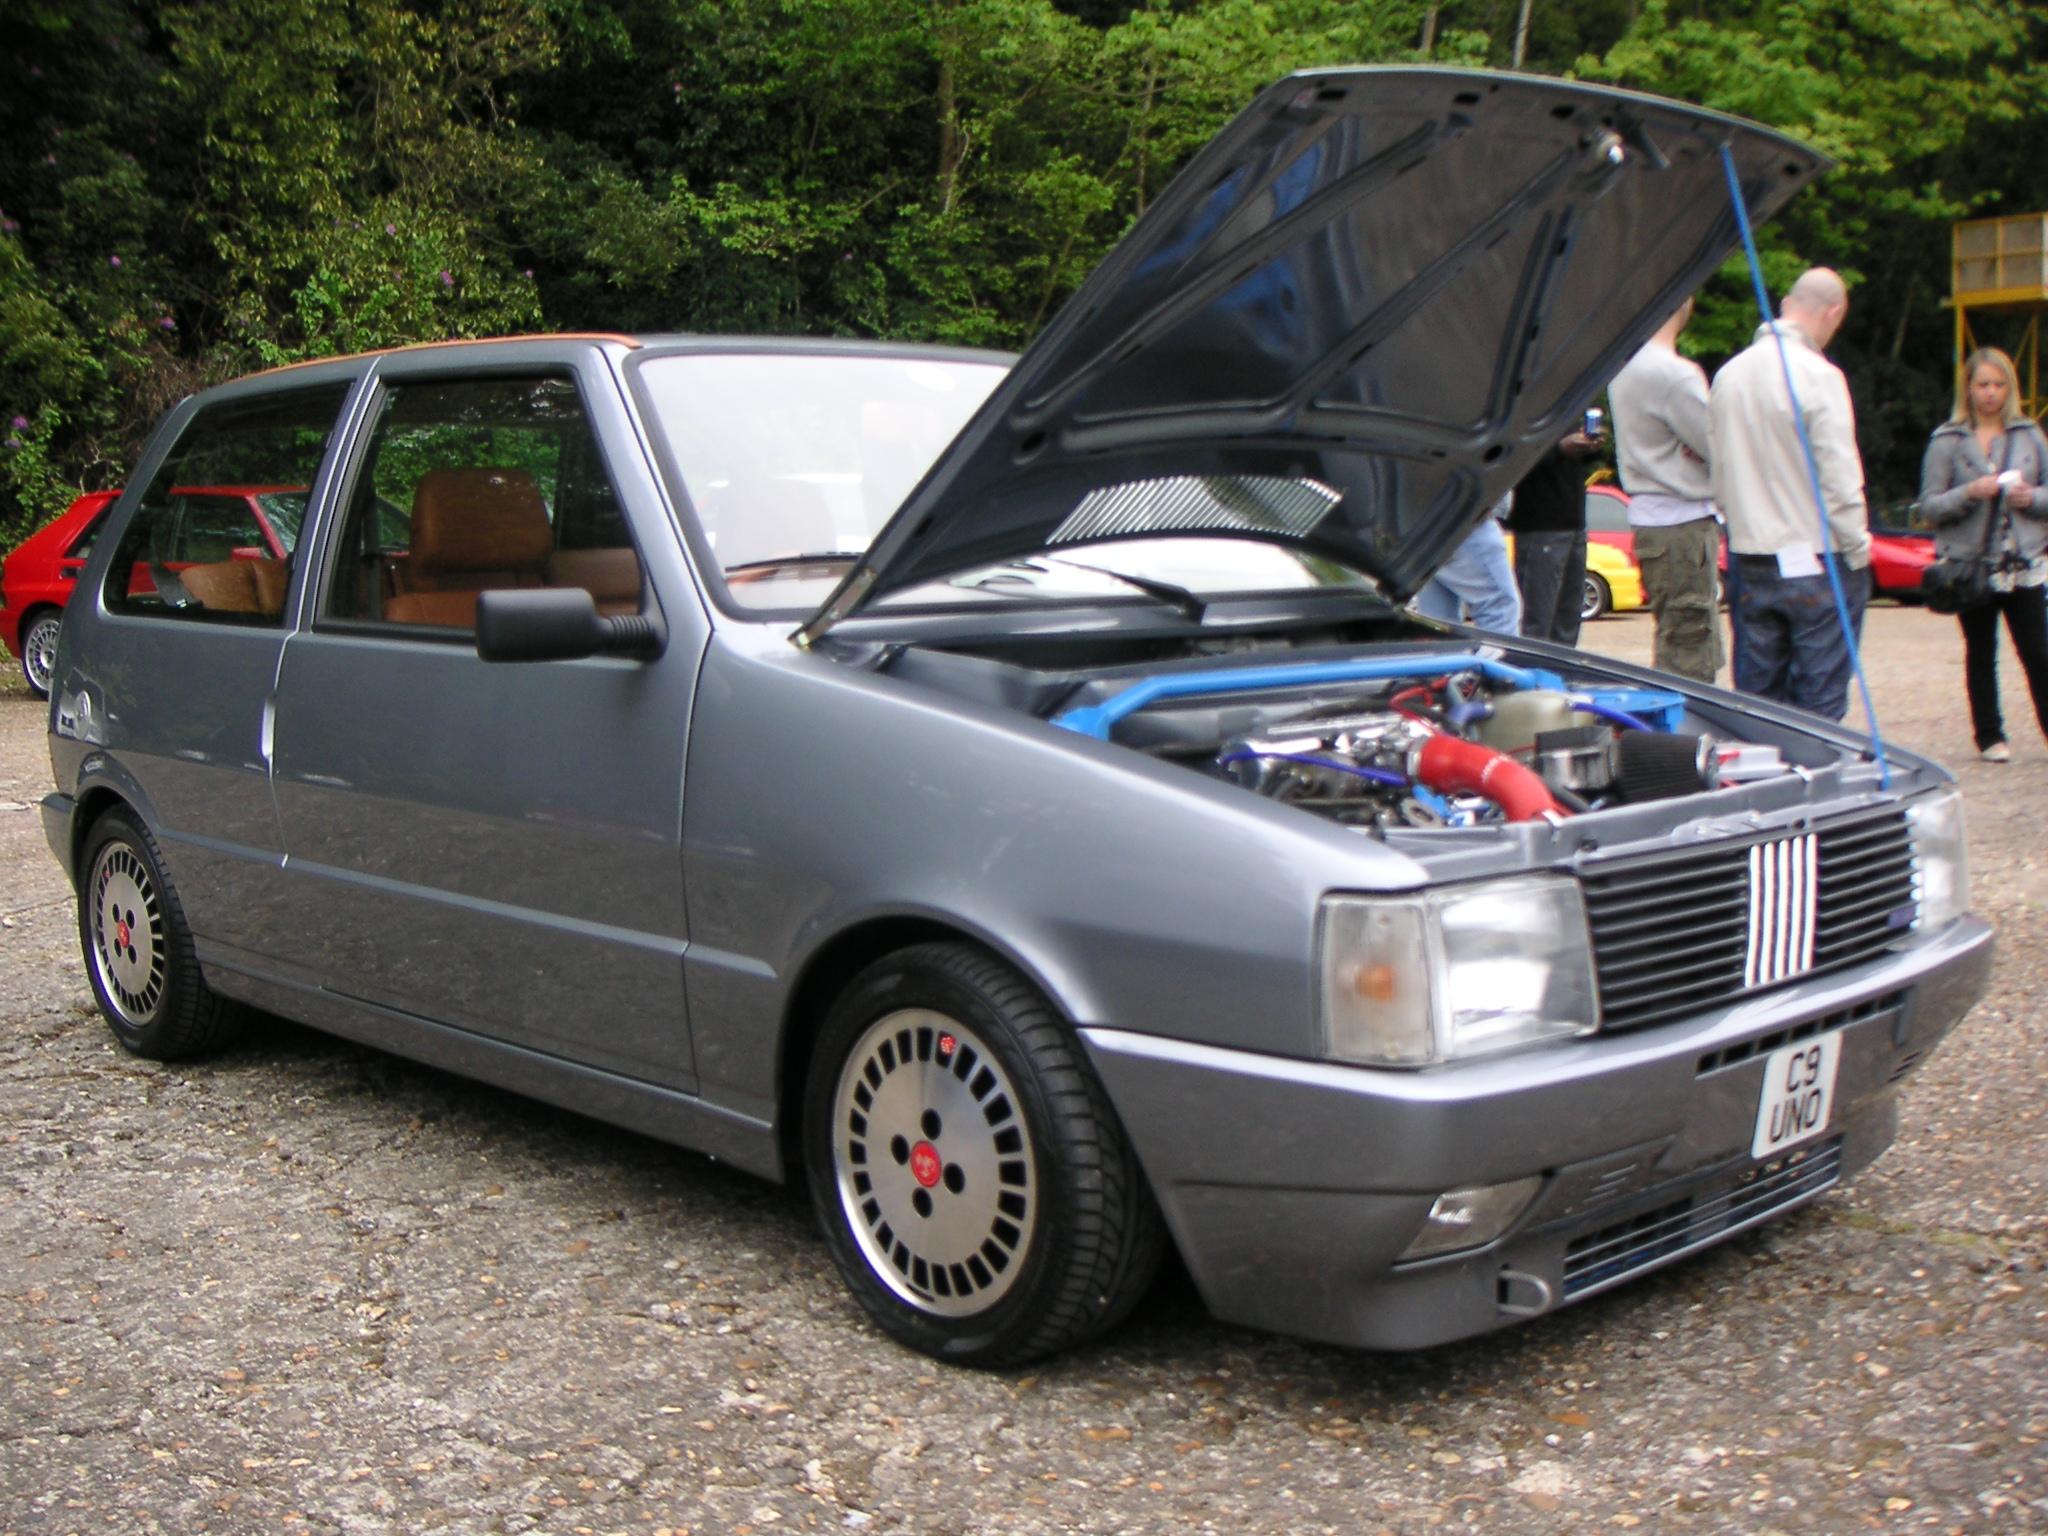 1988 MK1 Fiat Uno Turbo i.e. & 1990 MK1 Fiat Uno Turbo i.e.